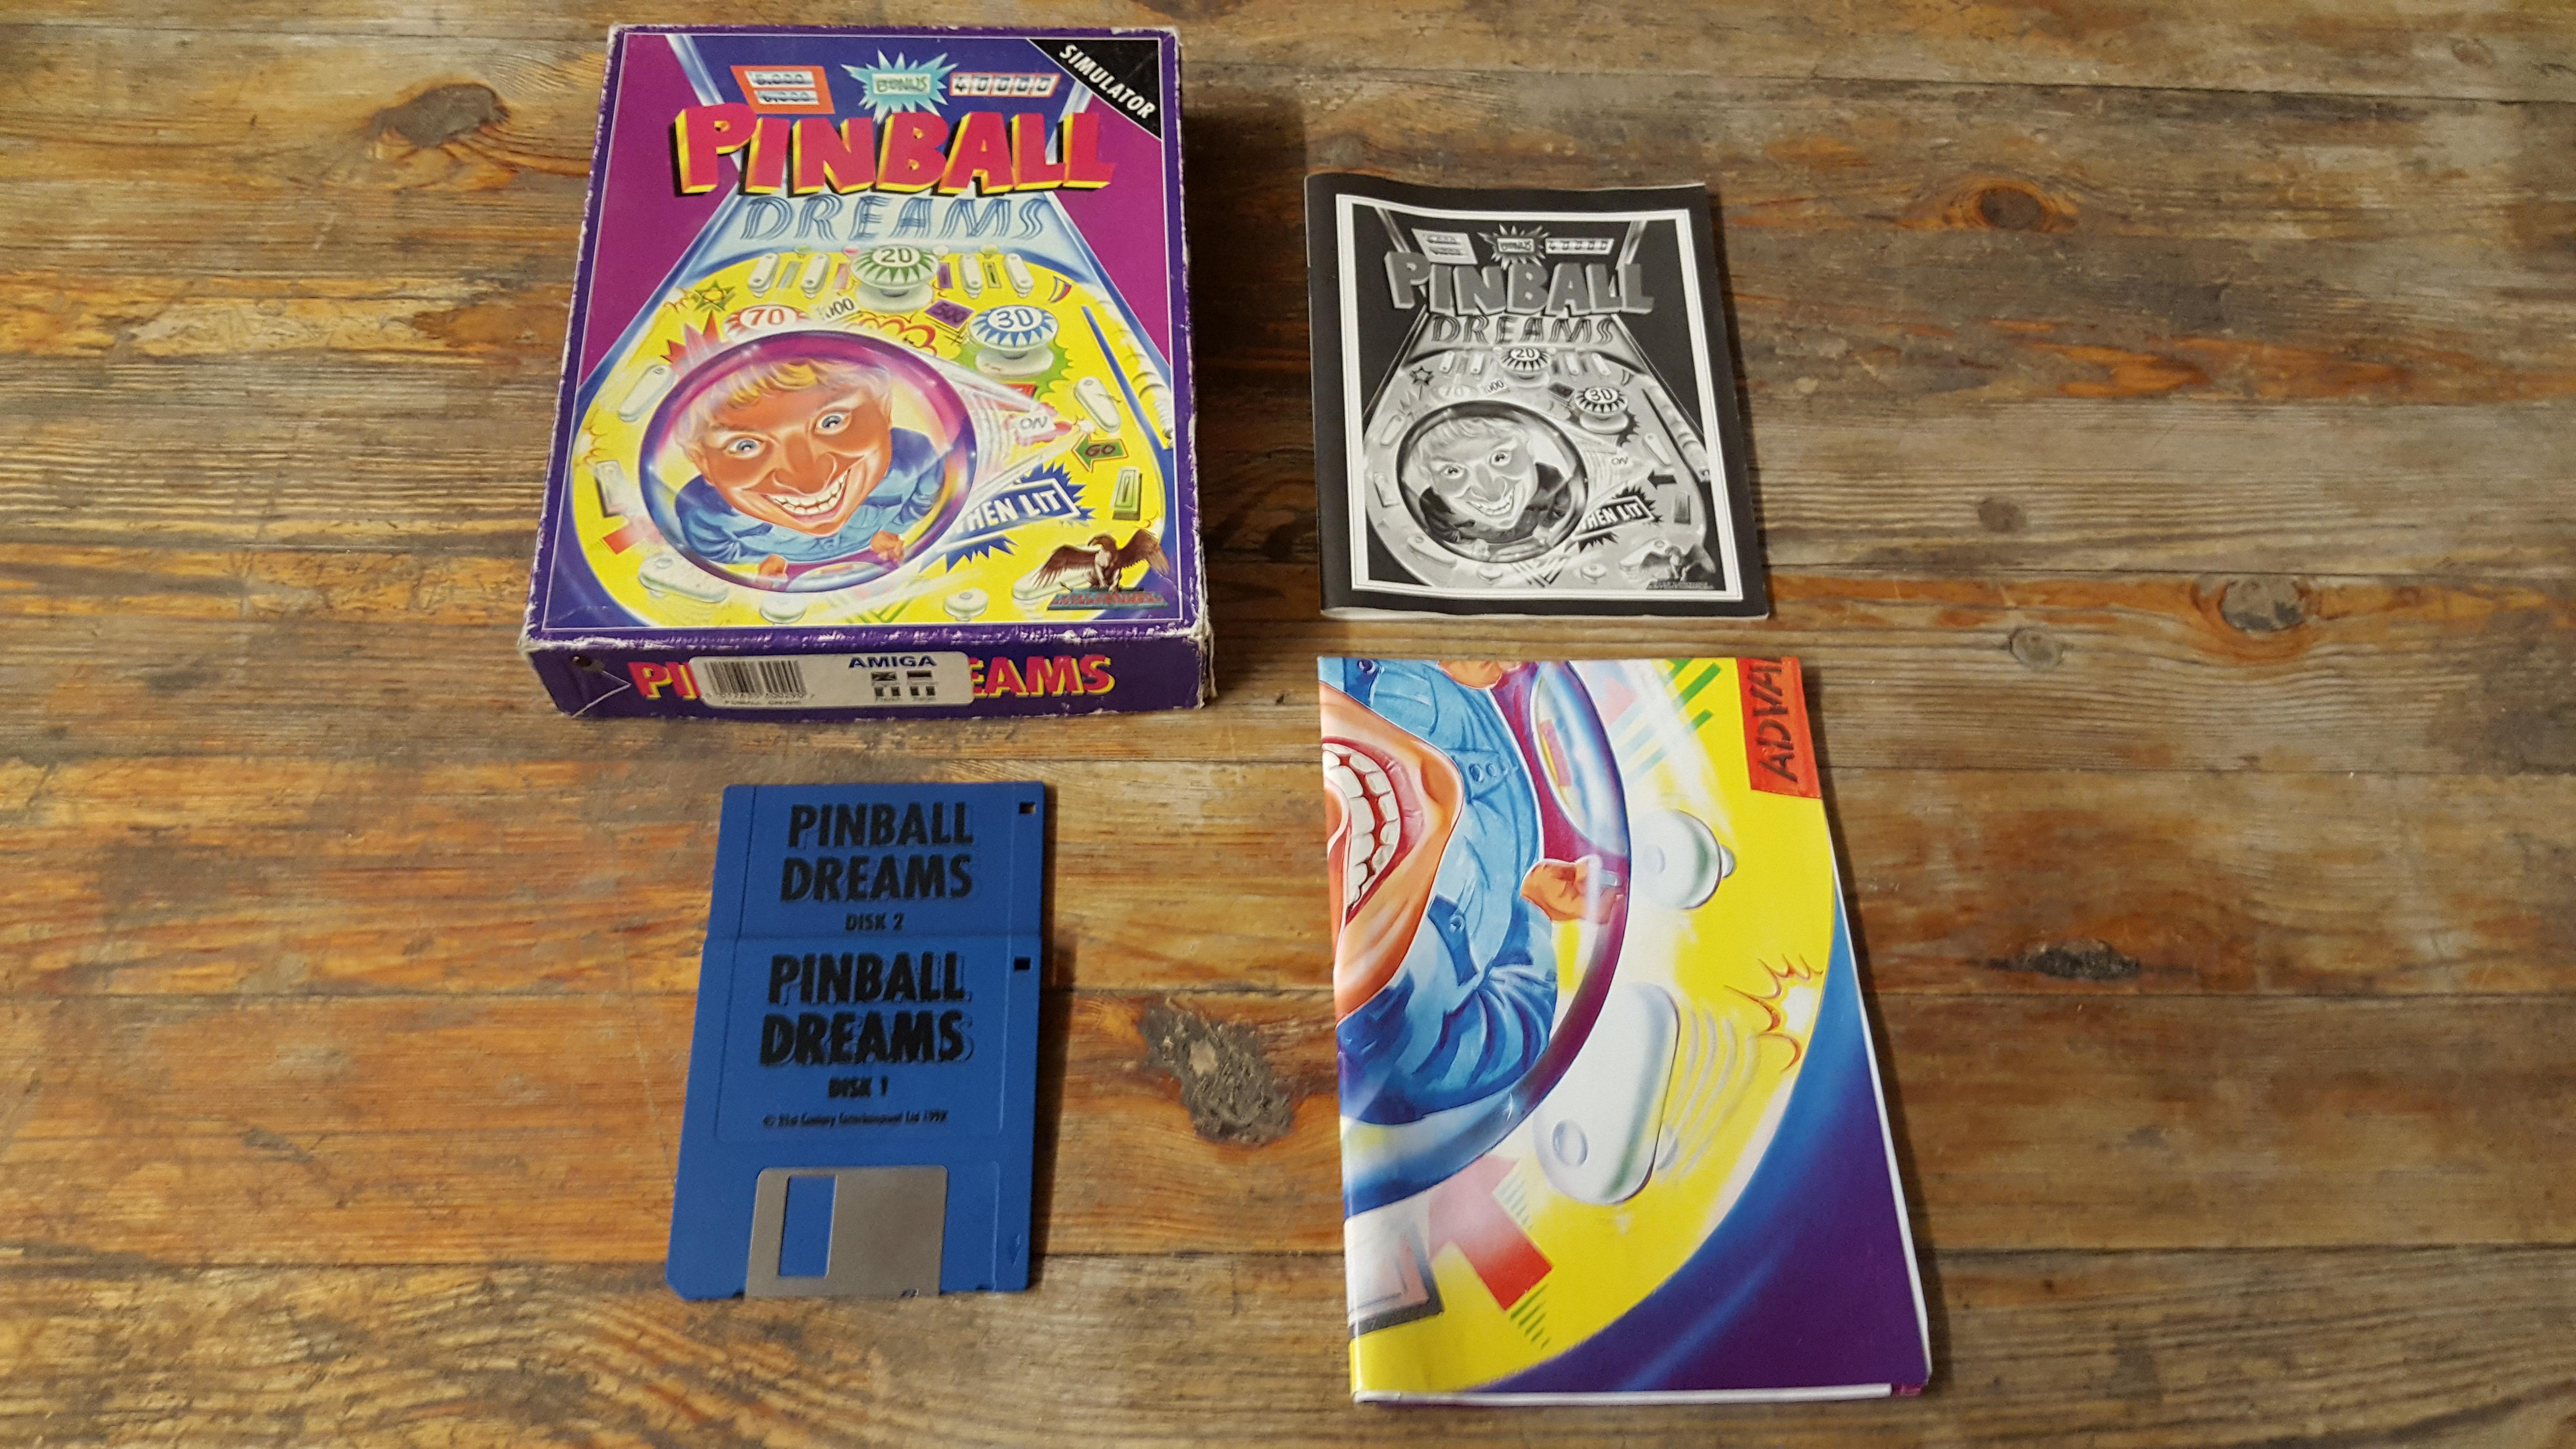 Vente ordinateurs et jeux Atari, Amiga, Amstrad et PC MAJ 20/01 - Page 5 Yl4rQ